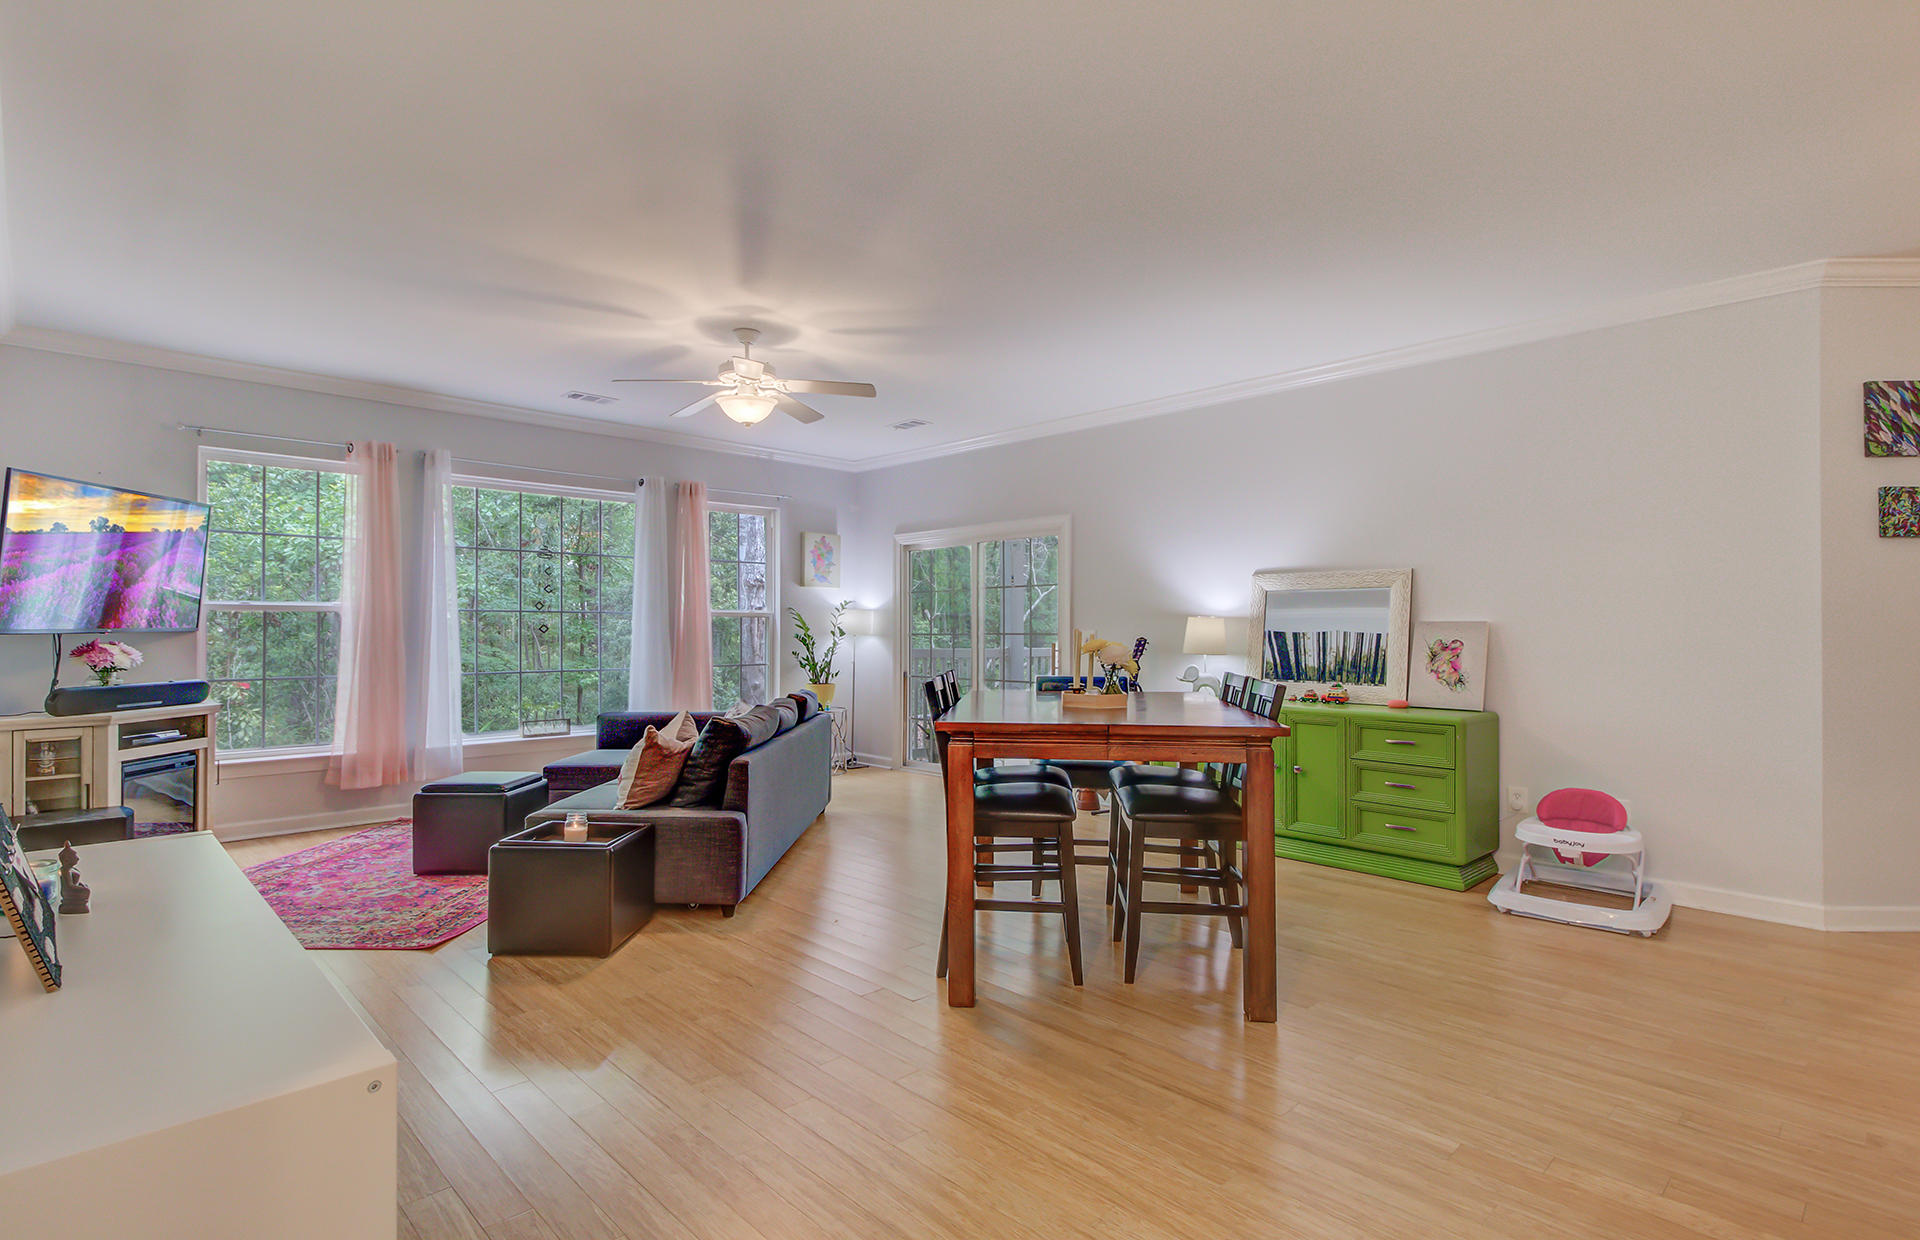 Dunes West Homes For Sale - 1566 Oxborough, Mount Pleasant, SC - 4